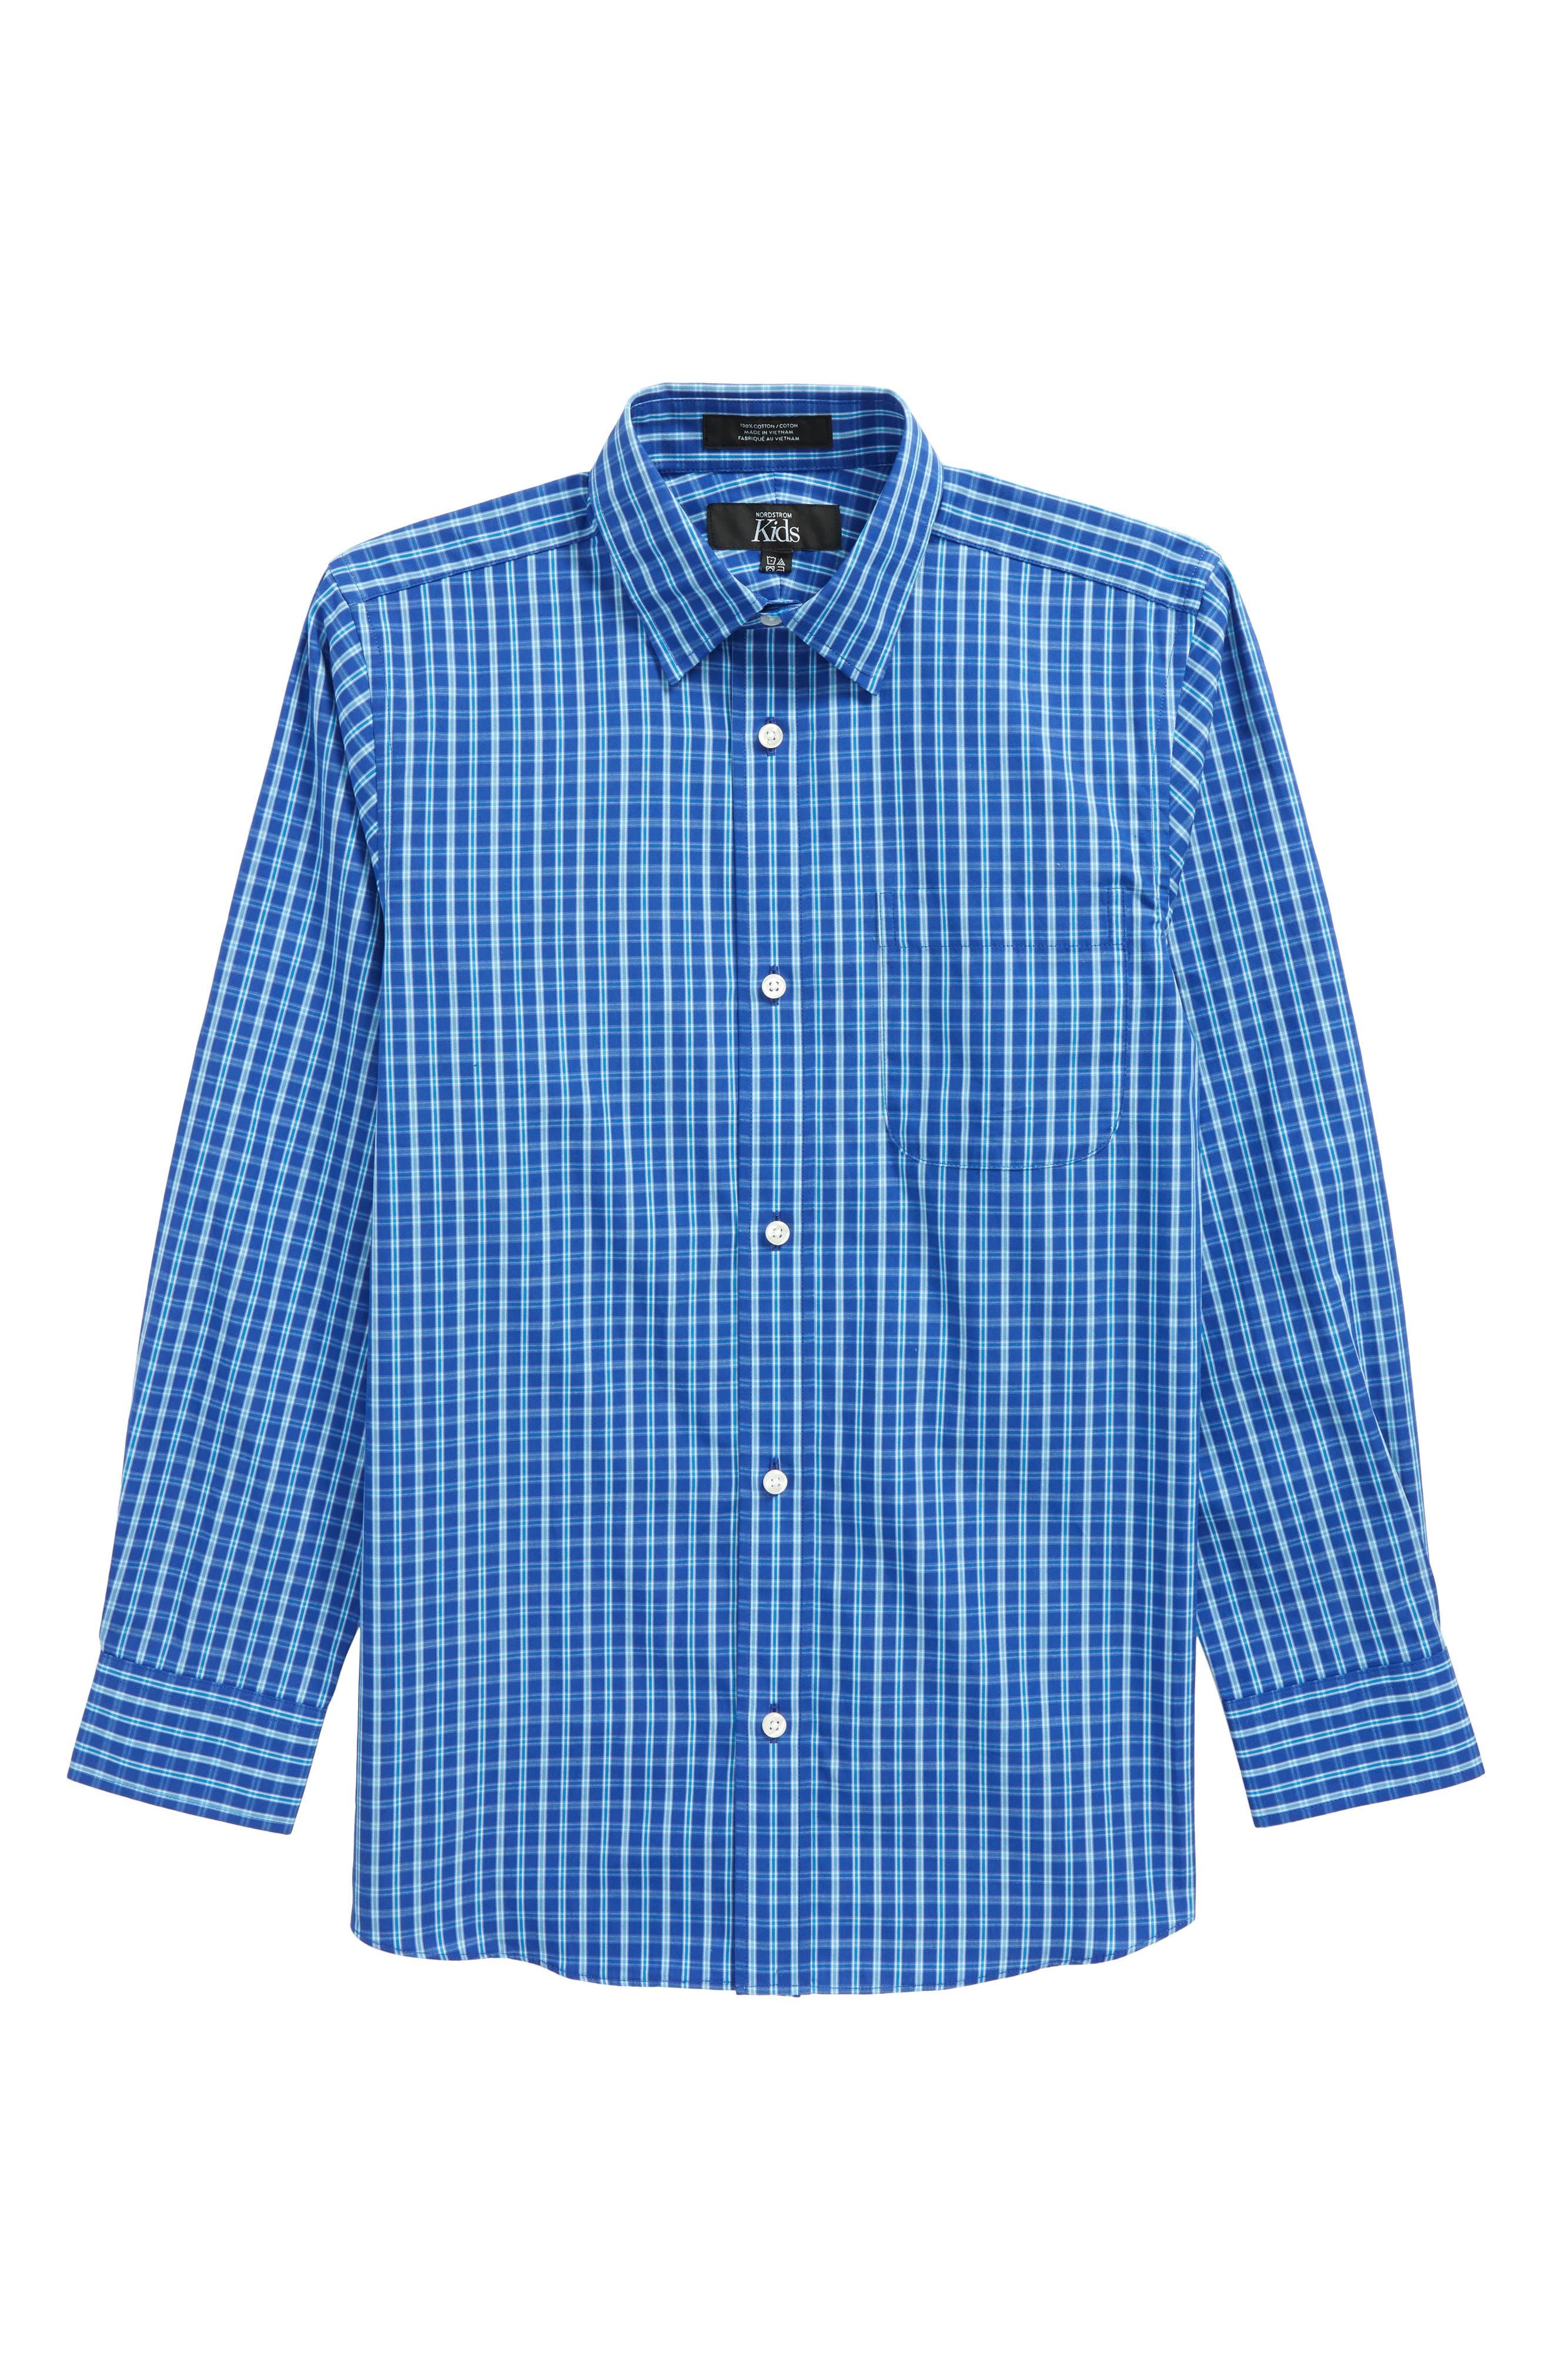 Plaid Dress Shirt,                             Main thumbnail 1, color,                             Blue Marine Plaid